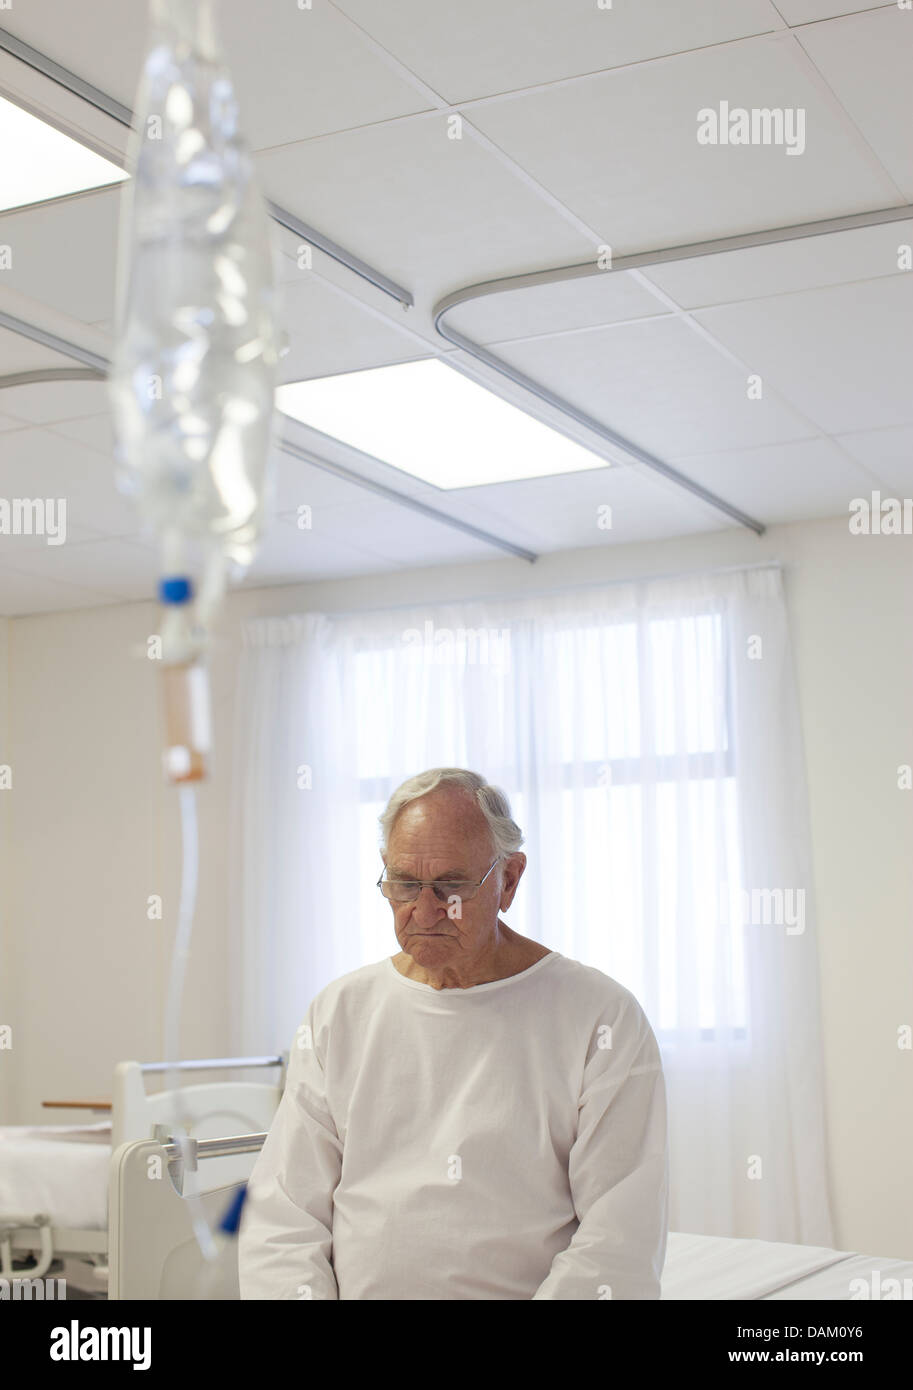 Ältere Patienten sitzen im Bett im Krankenzimmer Stockbild